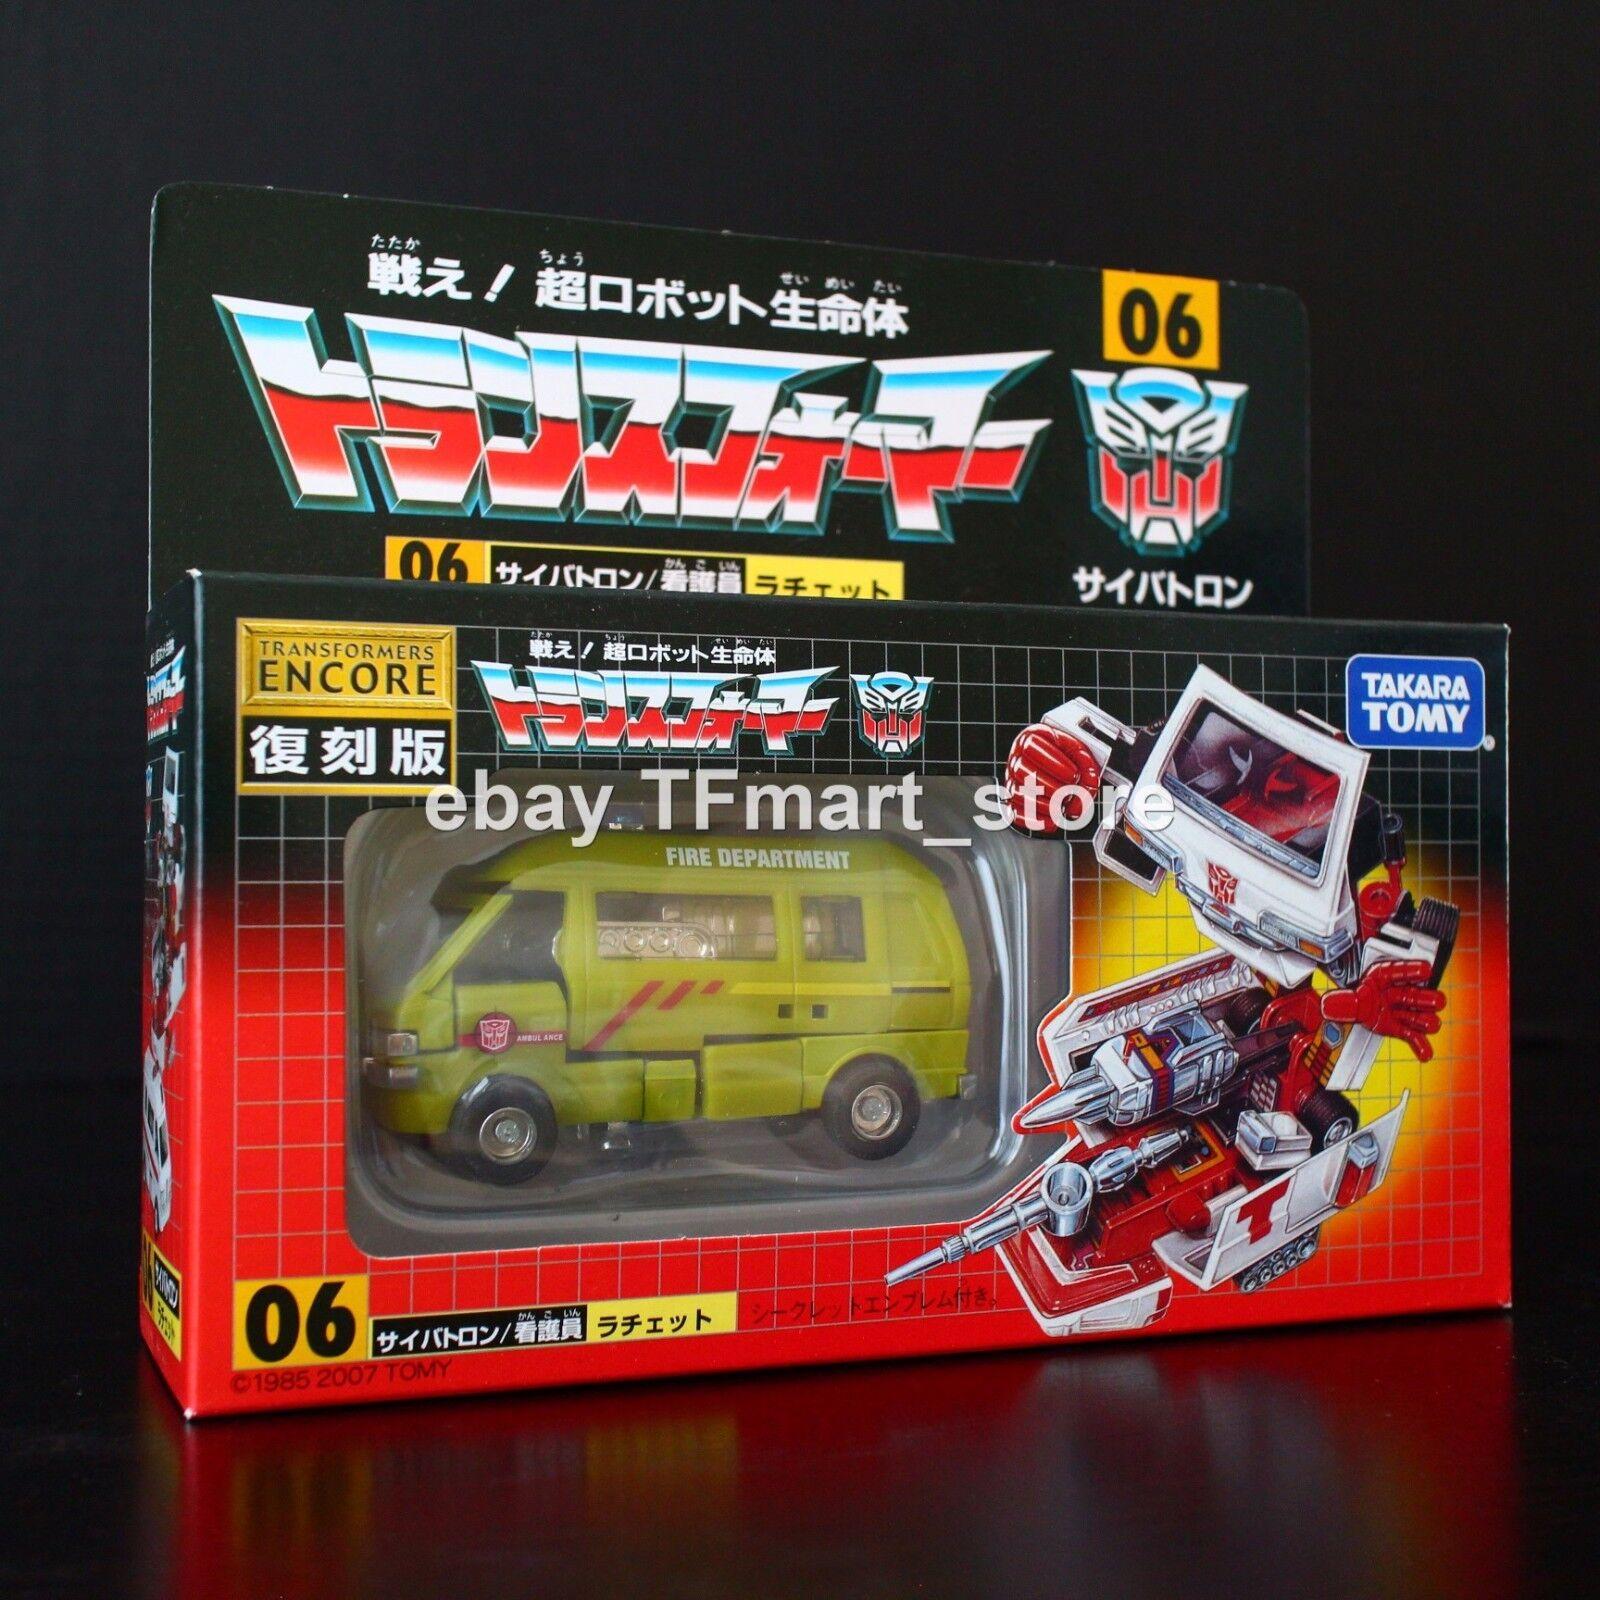 Transformers G1 Encore 06 ehobby Emergency verde Ratchet Movie Inspirosso Deco Nuovo